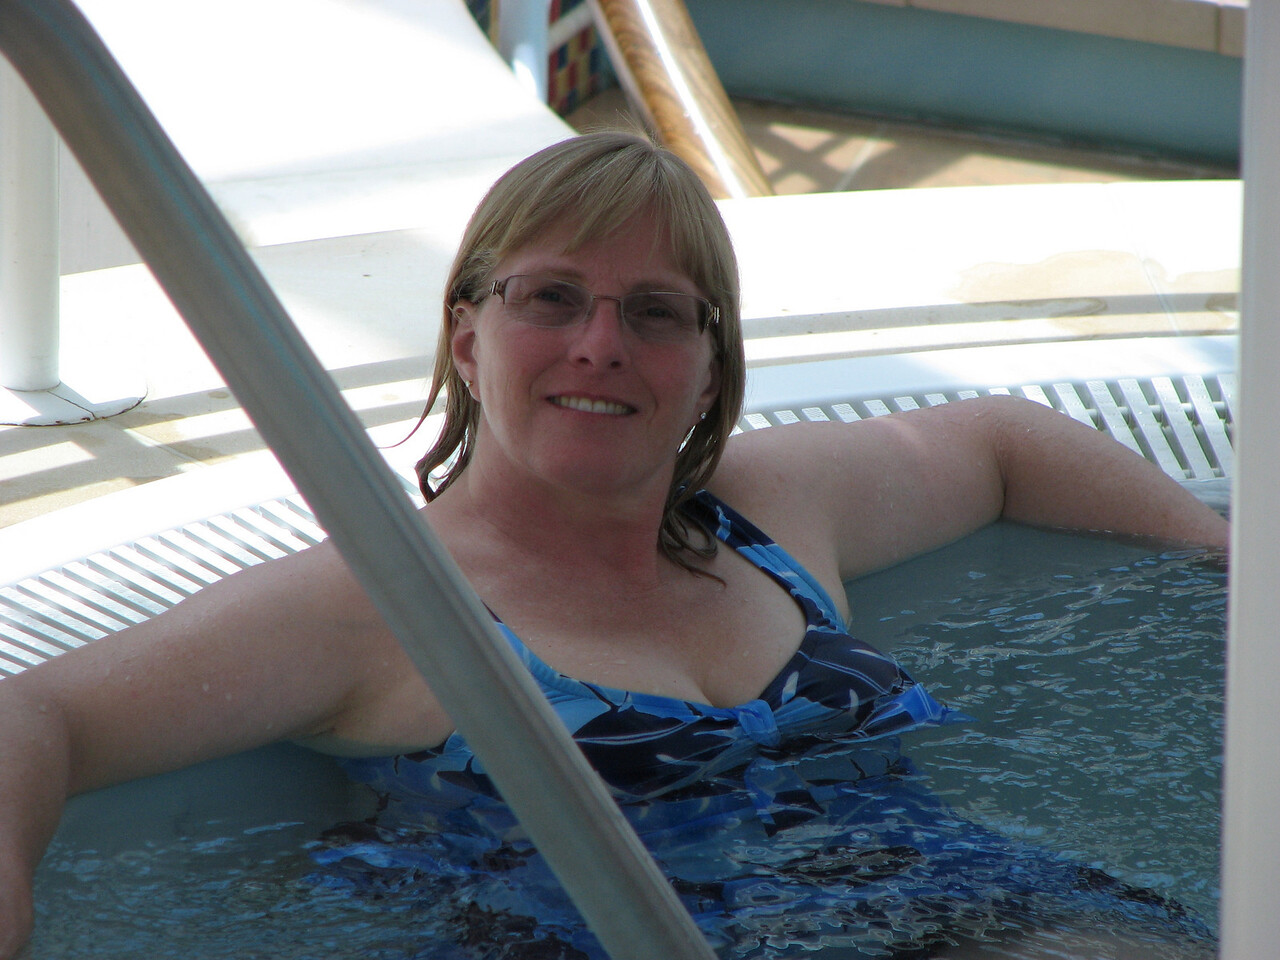 Karen in the hot tub